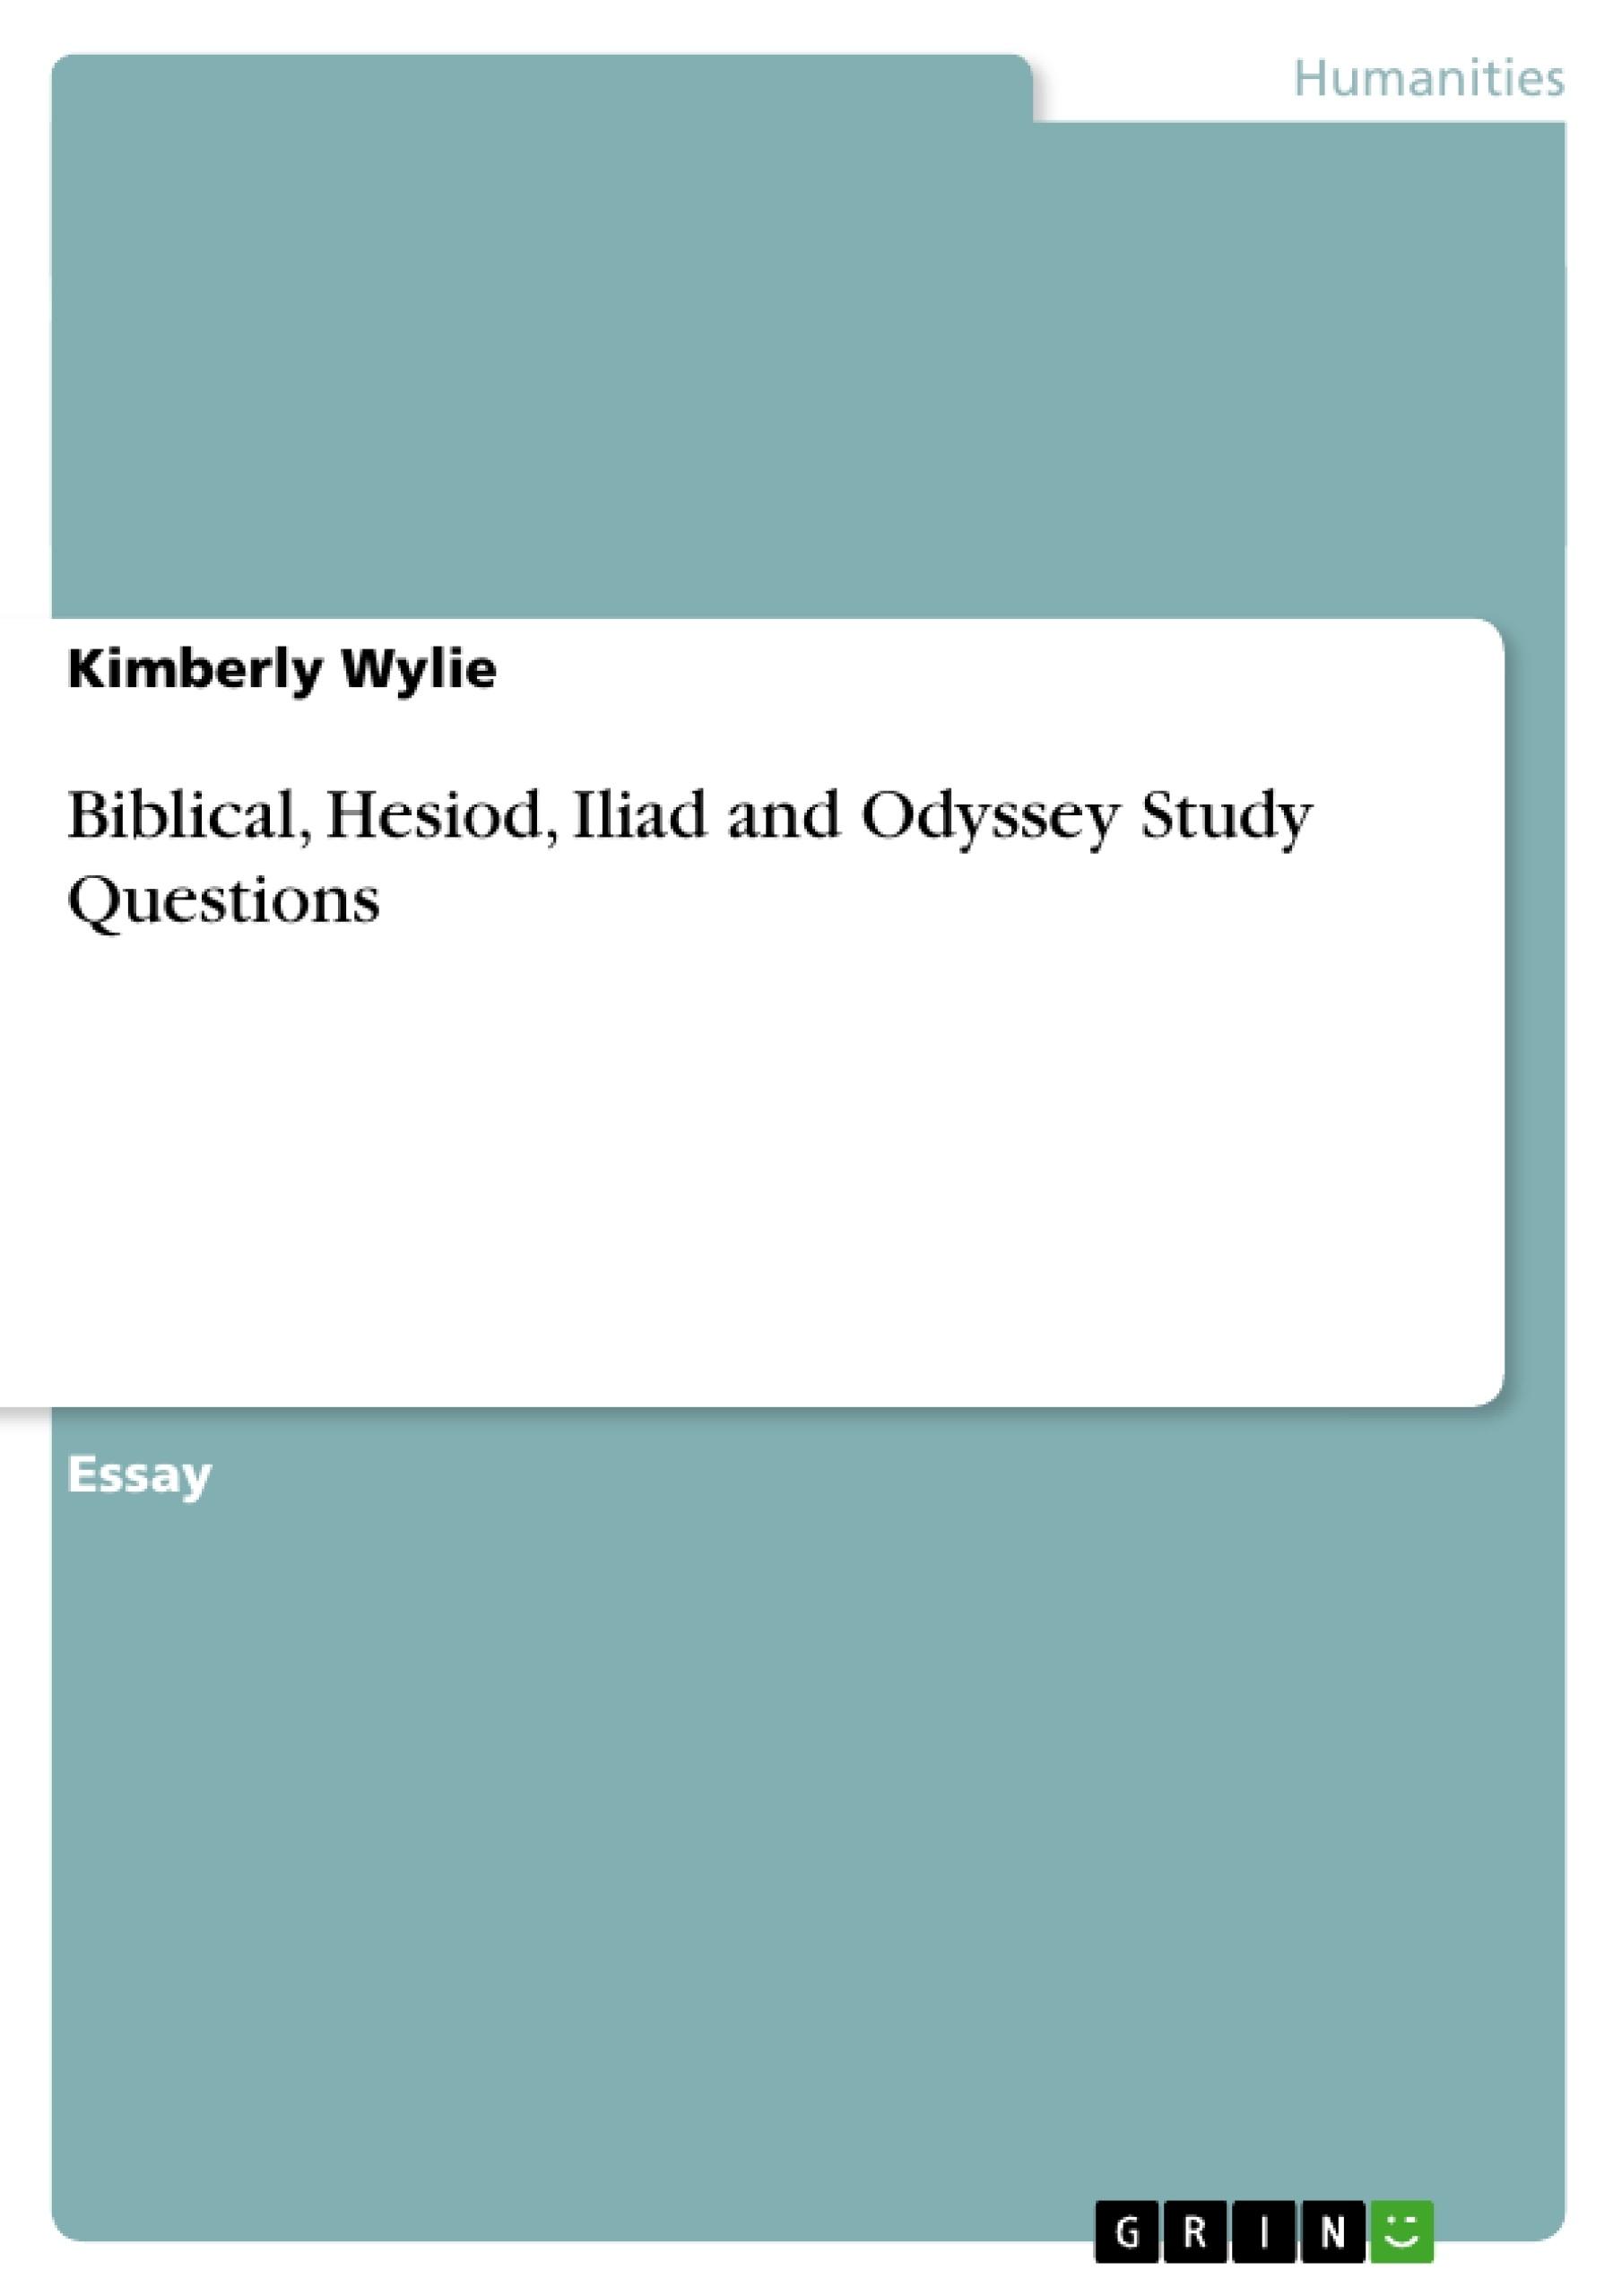 Title: Biblical, Hesiod, Iliad and Odyssey Study Questions